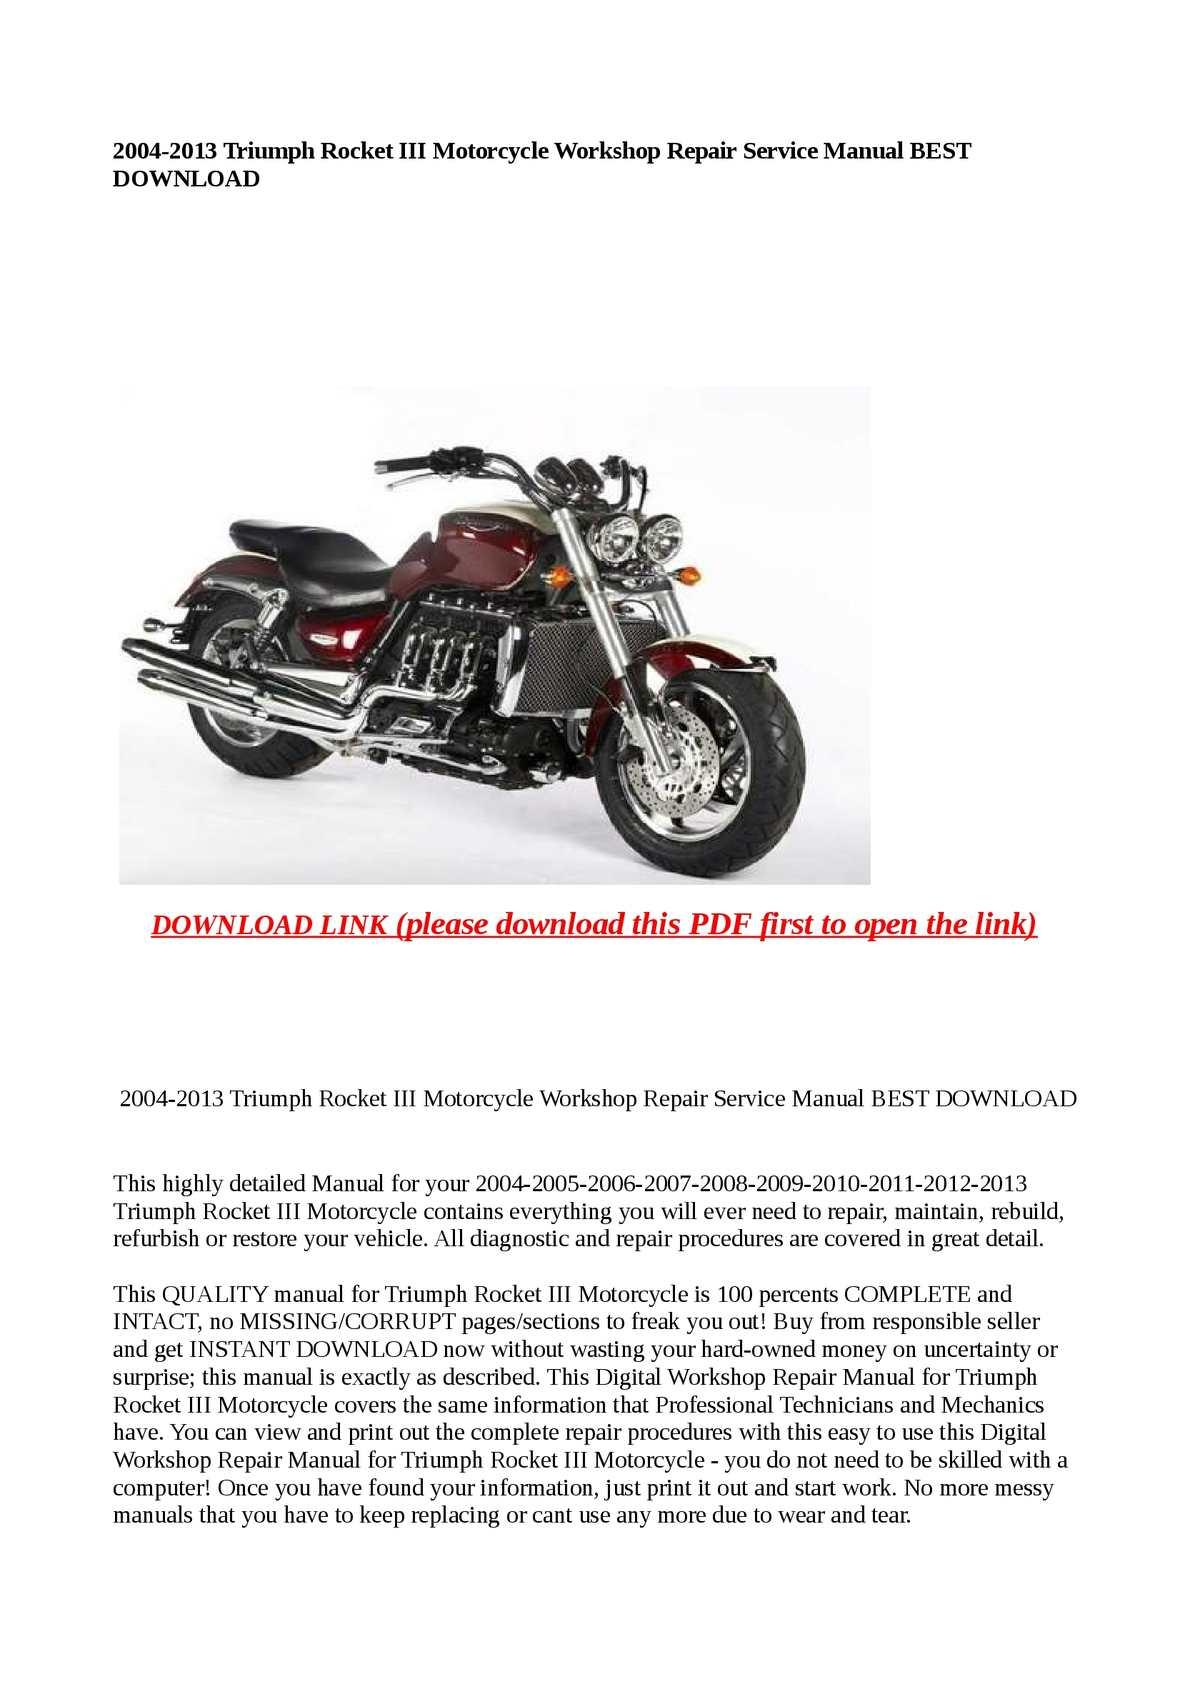 Calaméo - 2004-2013 Triumph Rocket III Motorcycle Workshop RepairCalaméo